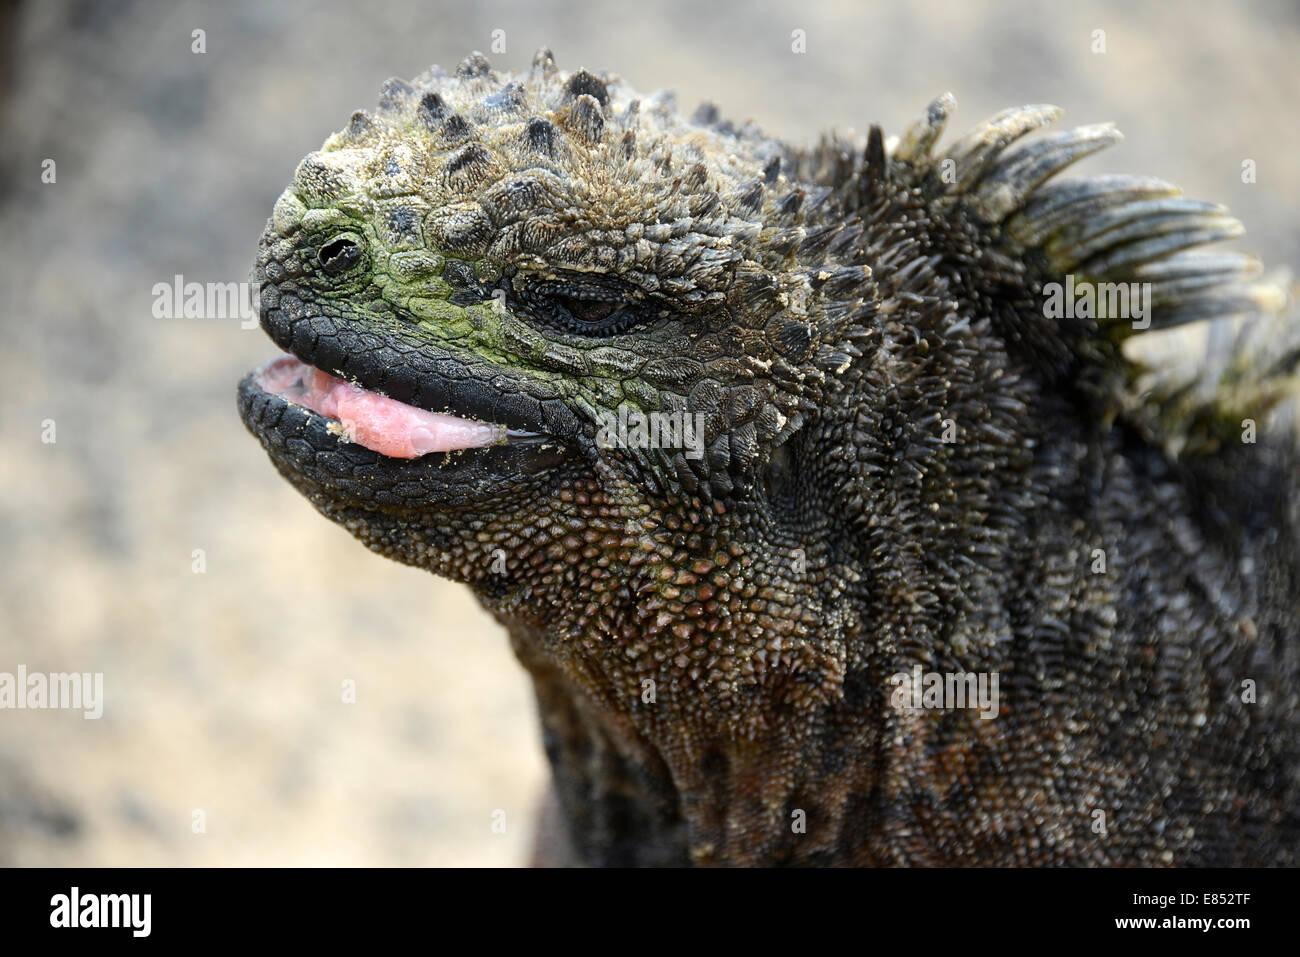 Galapagos Marine Iguana. Amblyrhynchus cristatus - is an iguana located only on the Galapagos, unique among modern - Stock Image